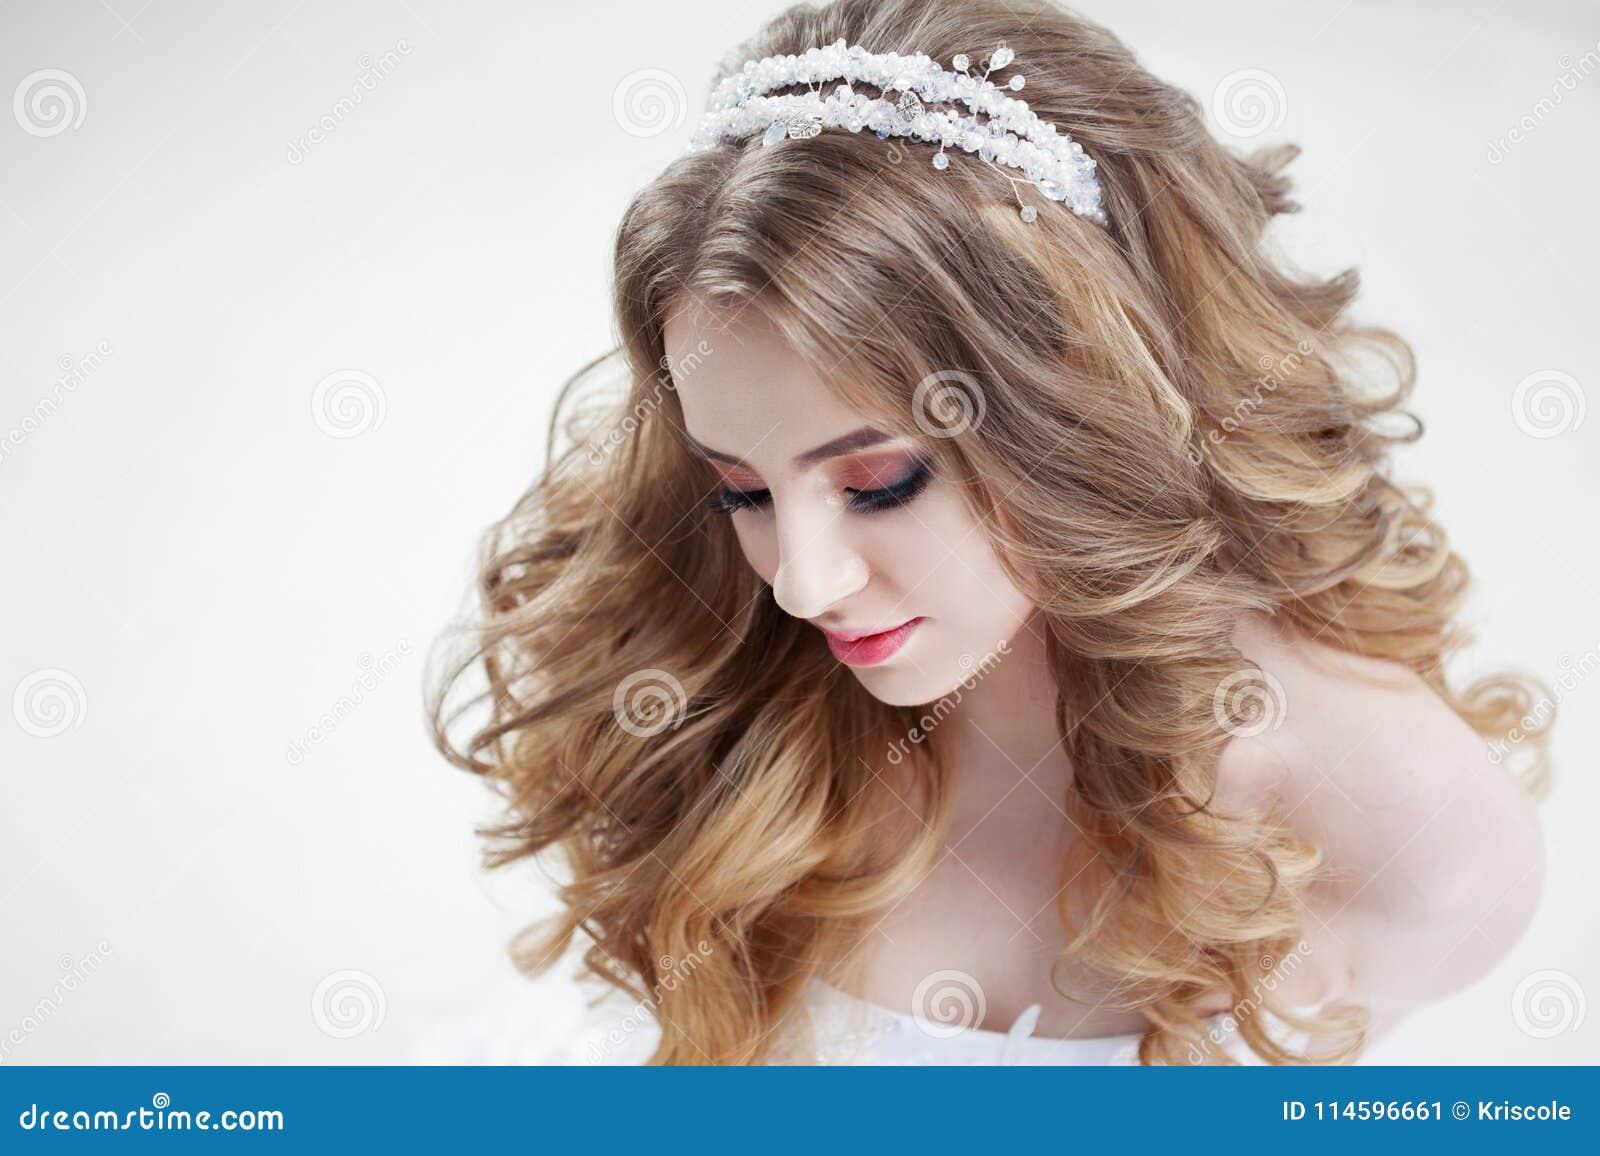 511ec57062 Νέα όμορφη νύφη με τις πολυτελείς μπούκλες Γάμος hairstyle με την τιάρα  Πορτρέτο κινηματογραφήσεων σε πρώτο πλάνο στο ελαφρύ υπόβαθρο. Φωτογραφία  ...